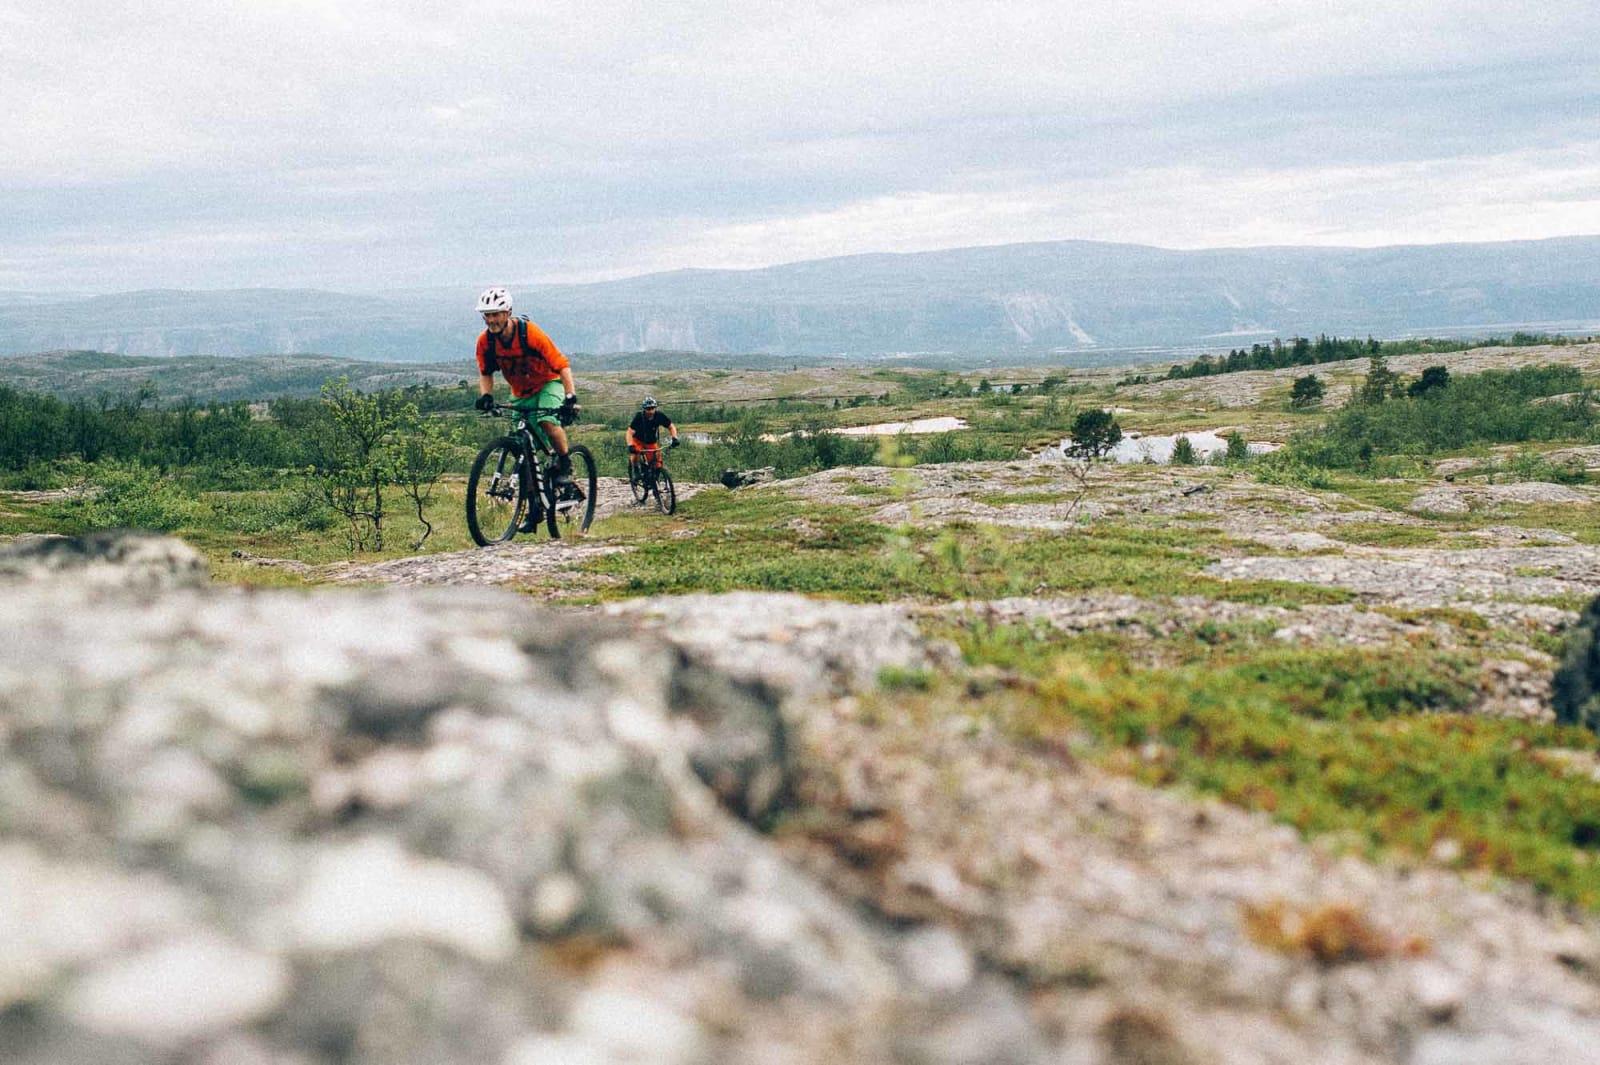 GEOLOGIEN PÅ SIN SIDE: Dan Kristian Sandmo leder an over flytstier med smågrus.